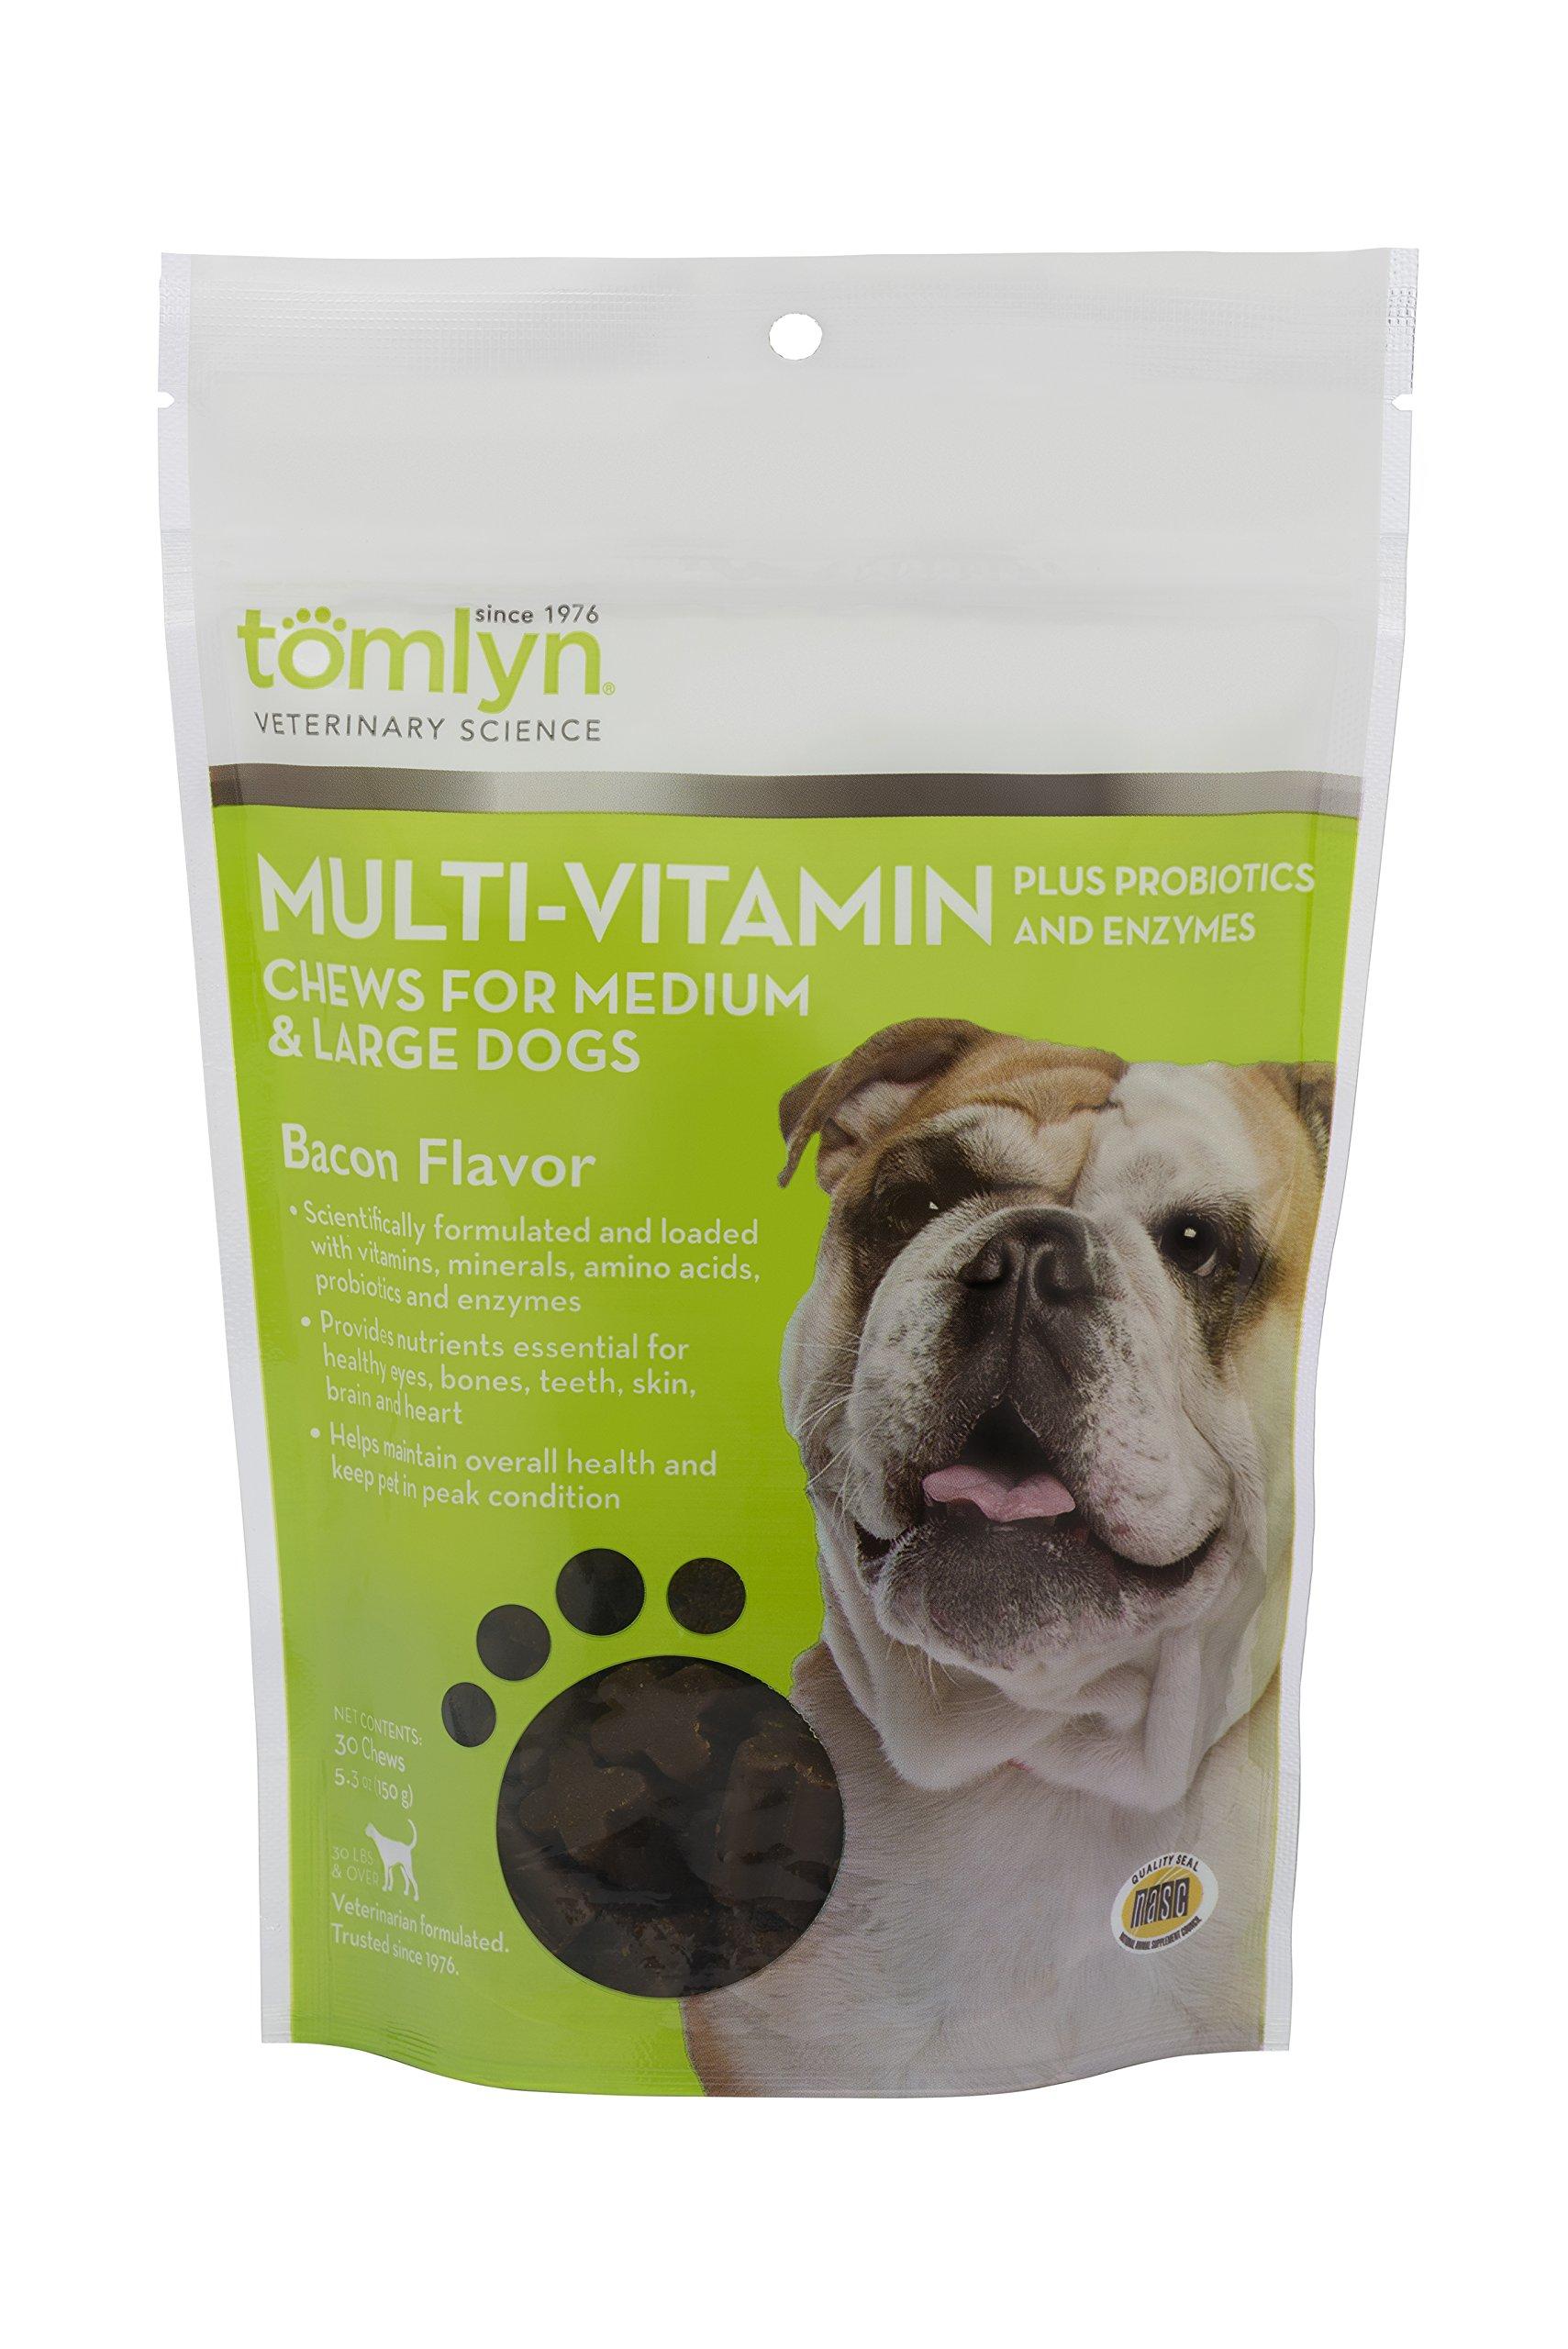 Tom Lyn Tomlyn Multi-Vitamin Chews for Medium and Large Dogs